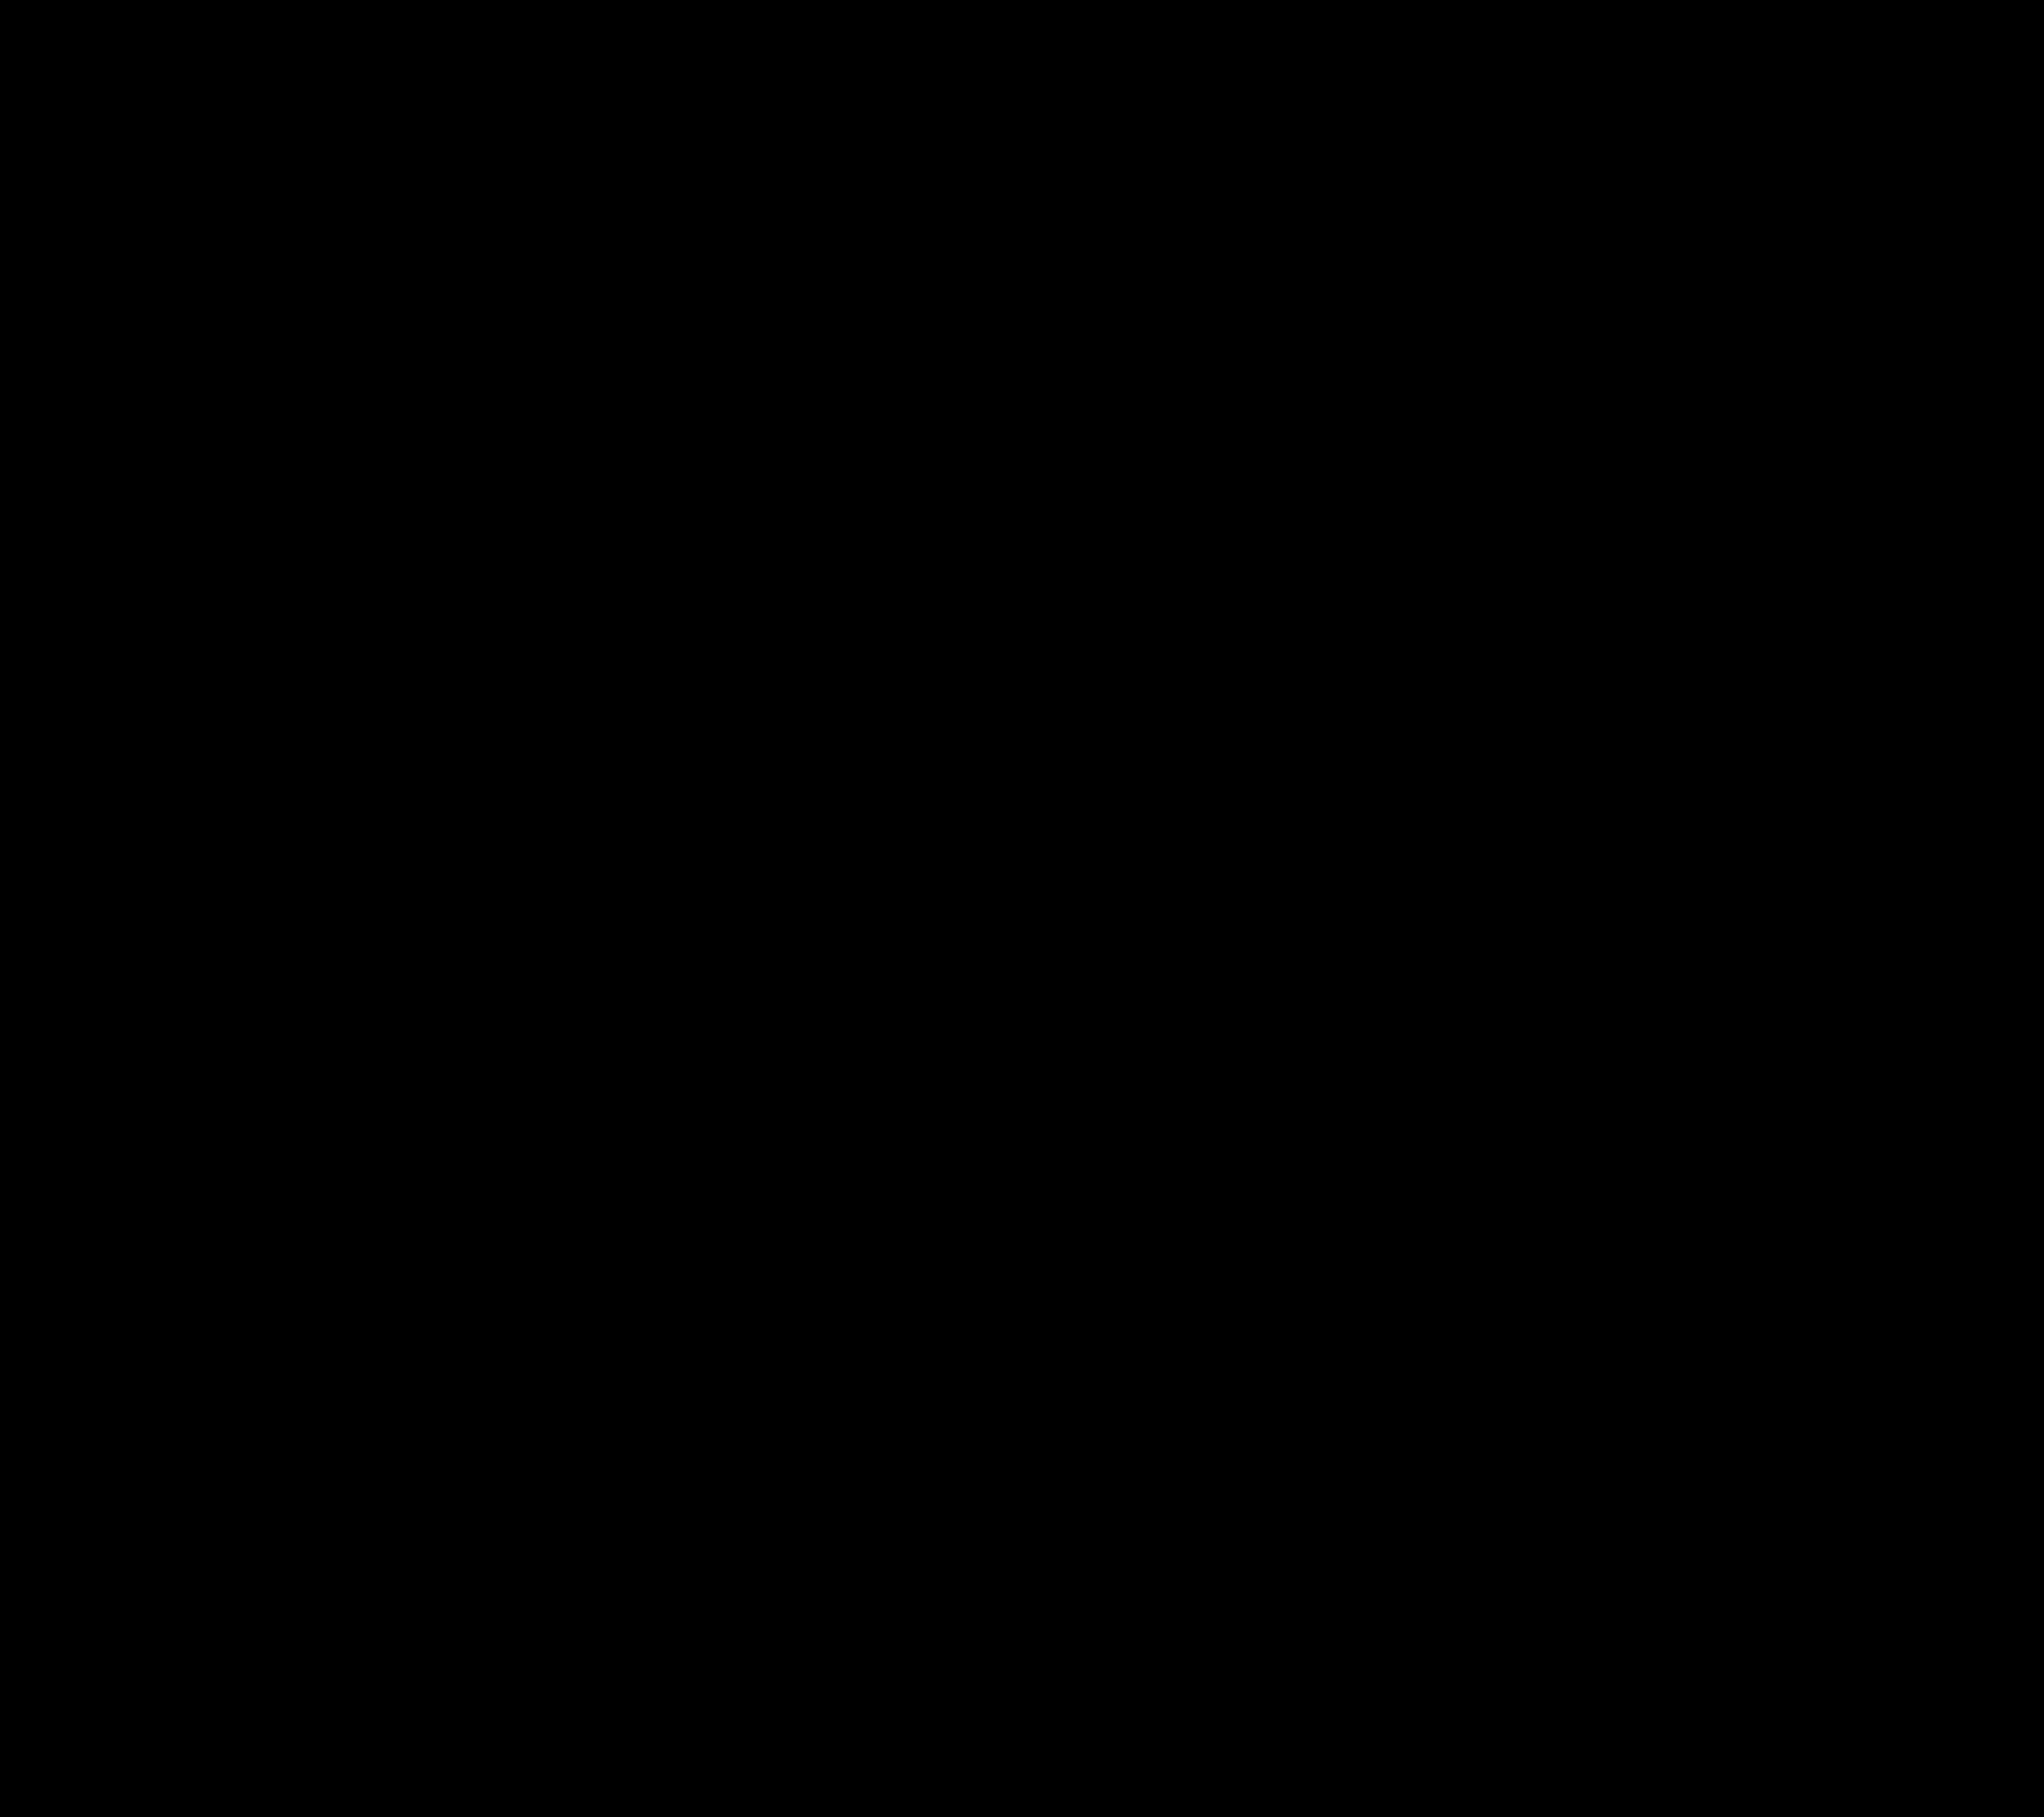 2319x2062 Clipart